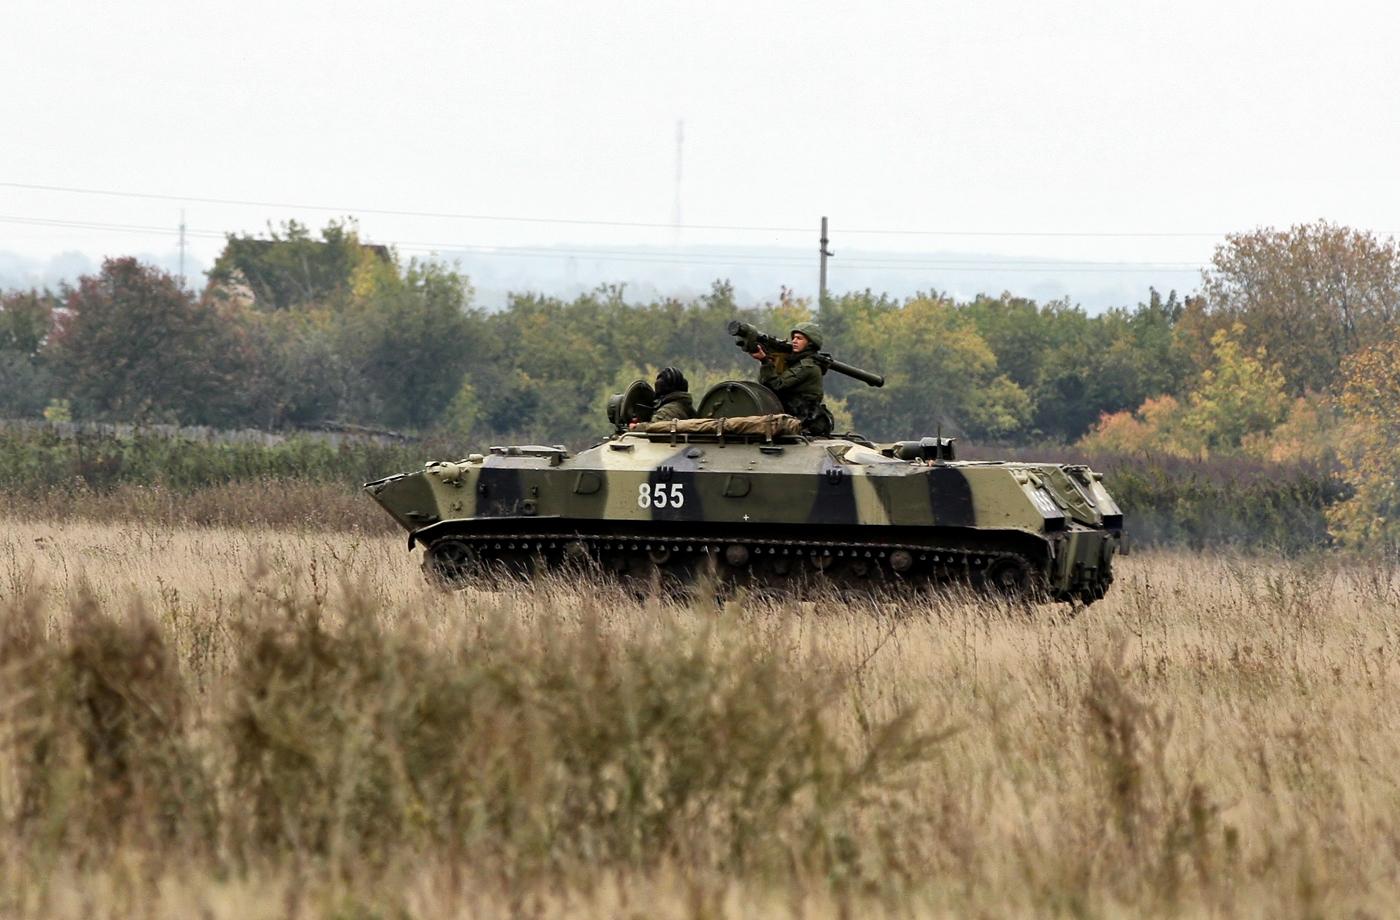 137_AirborneRegiment_-_BTR-D,_MANPADS.jp